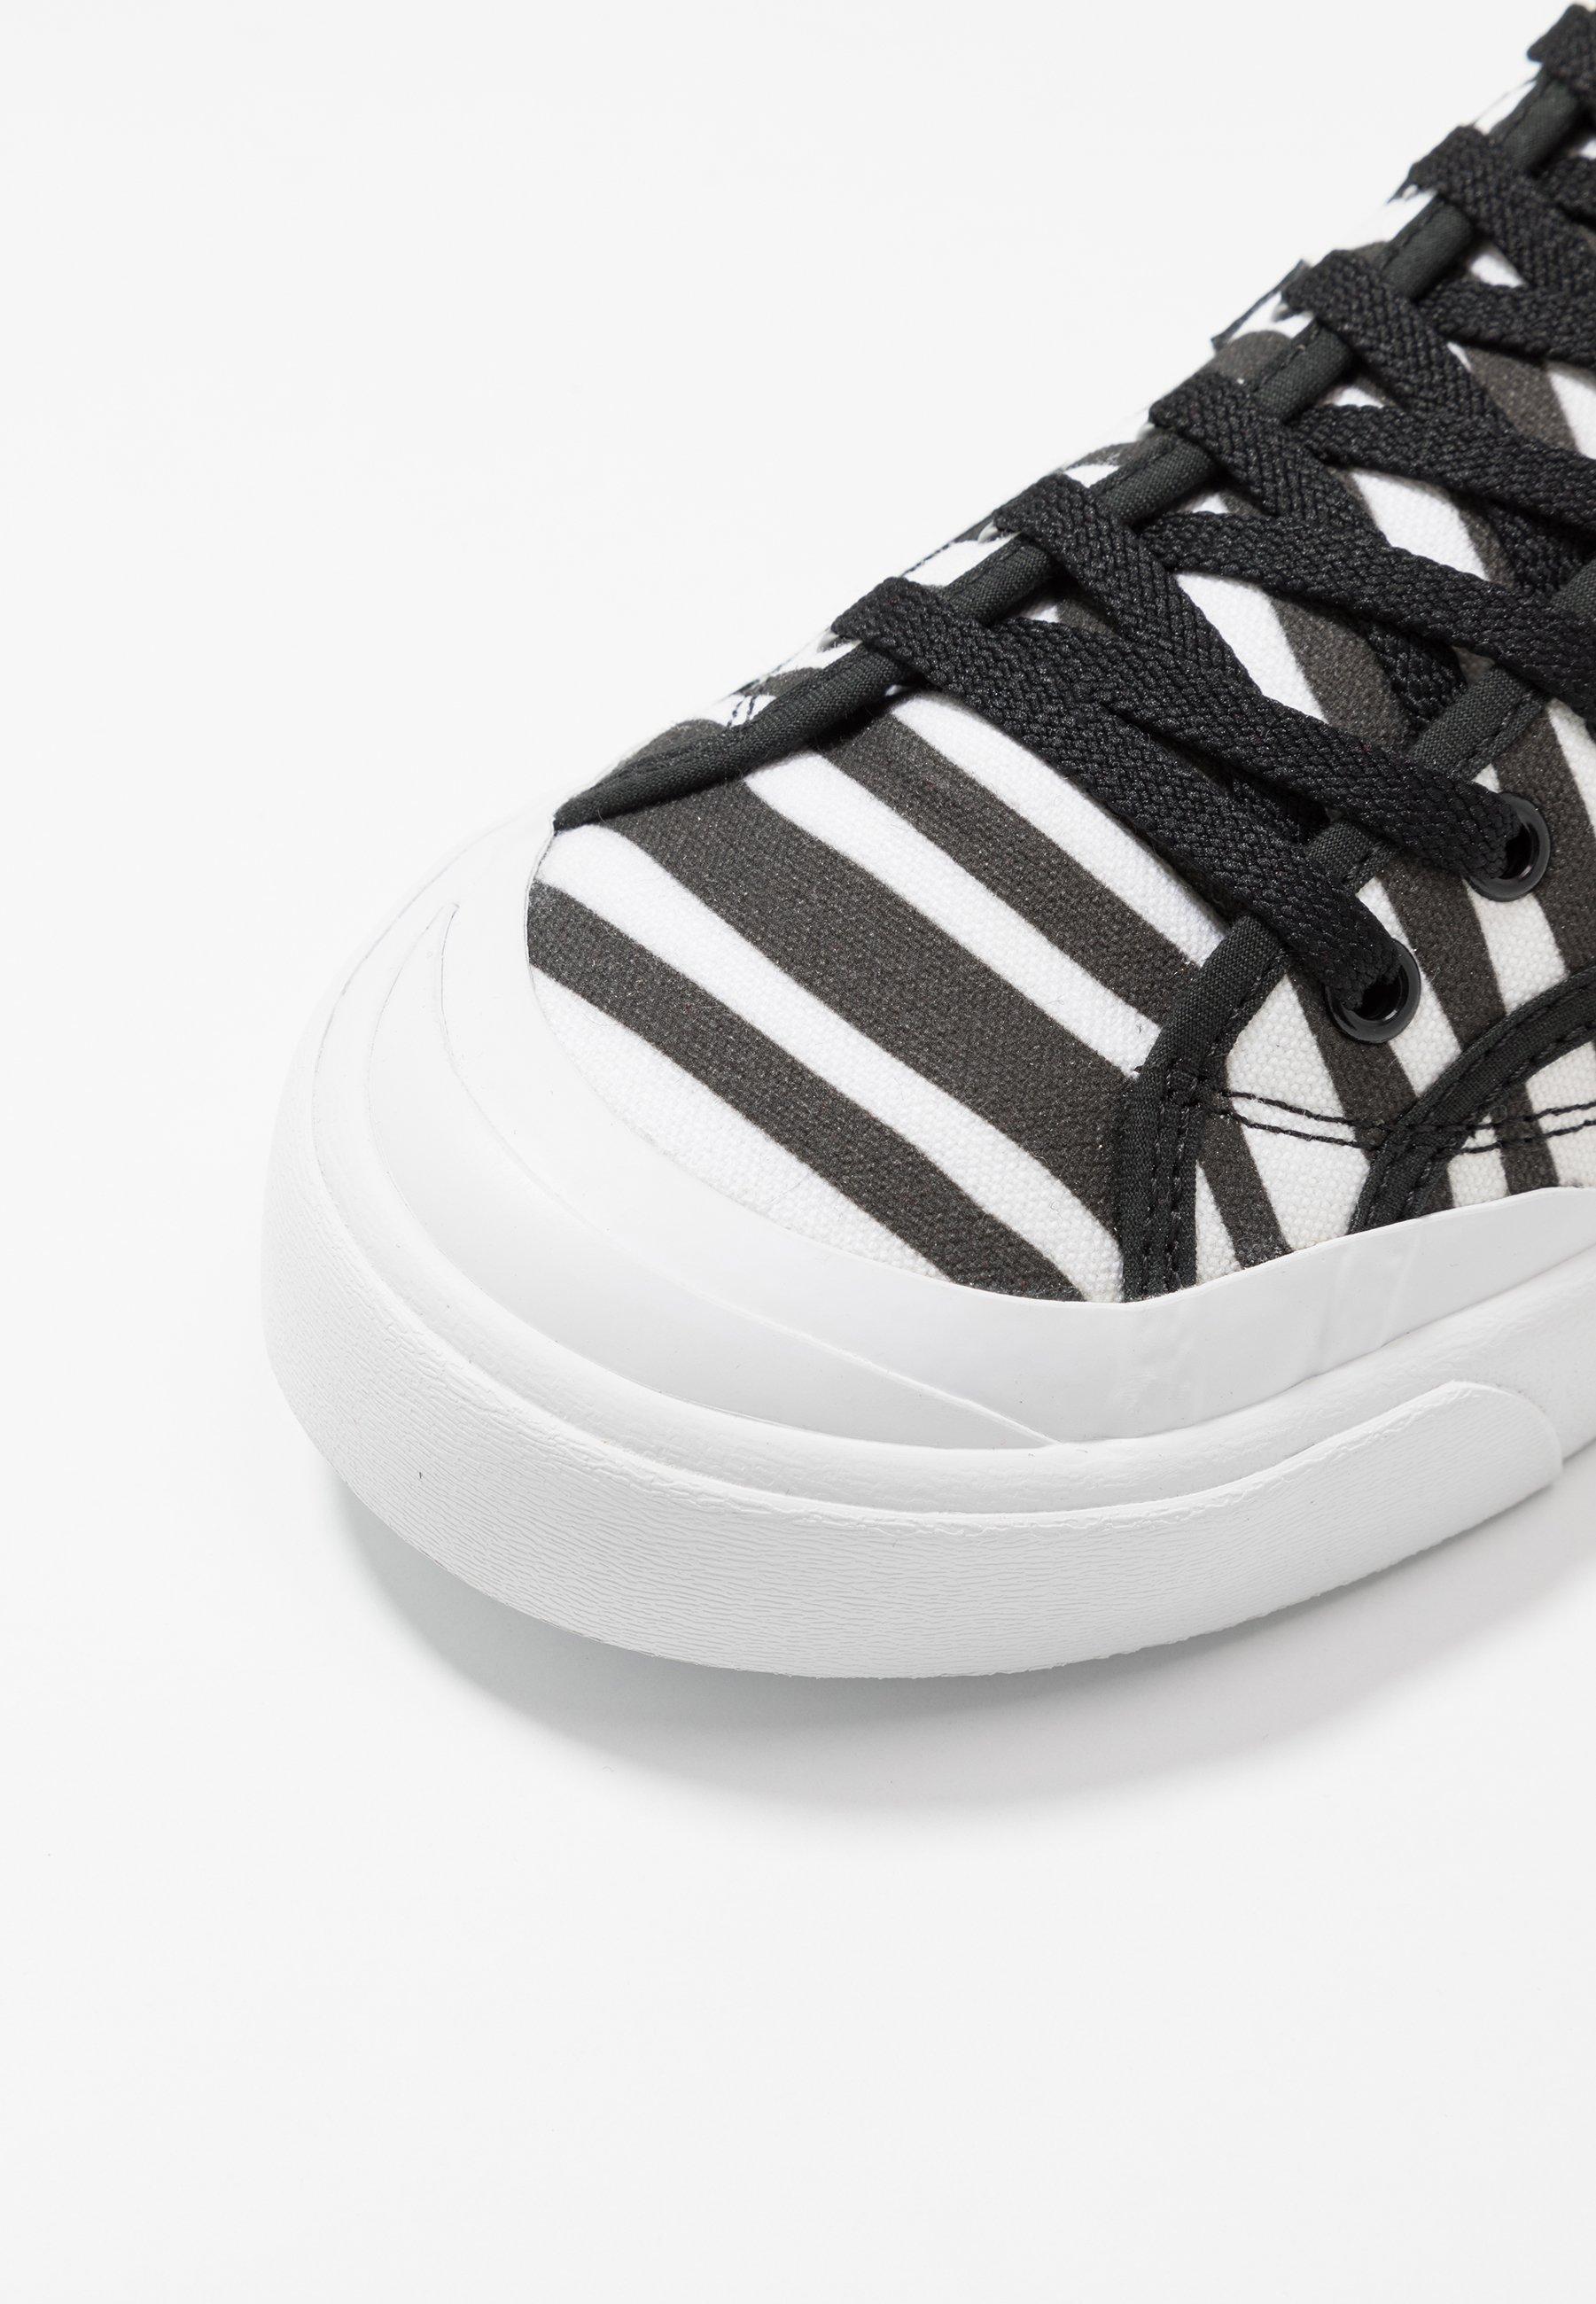 PROCT Sneakers multicolors